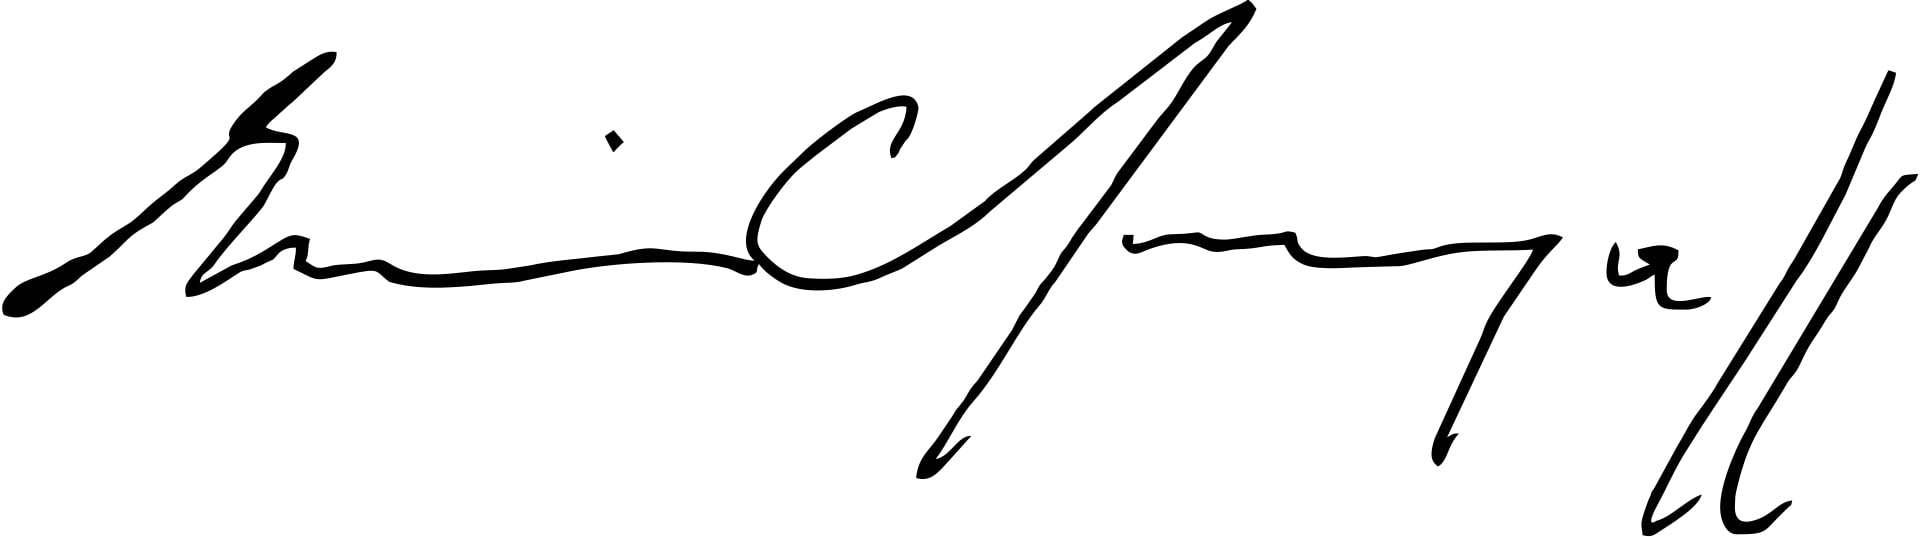 Erwin Chargaff Signature